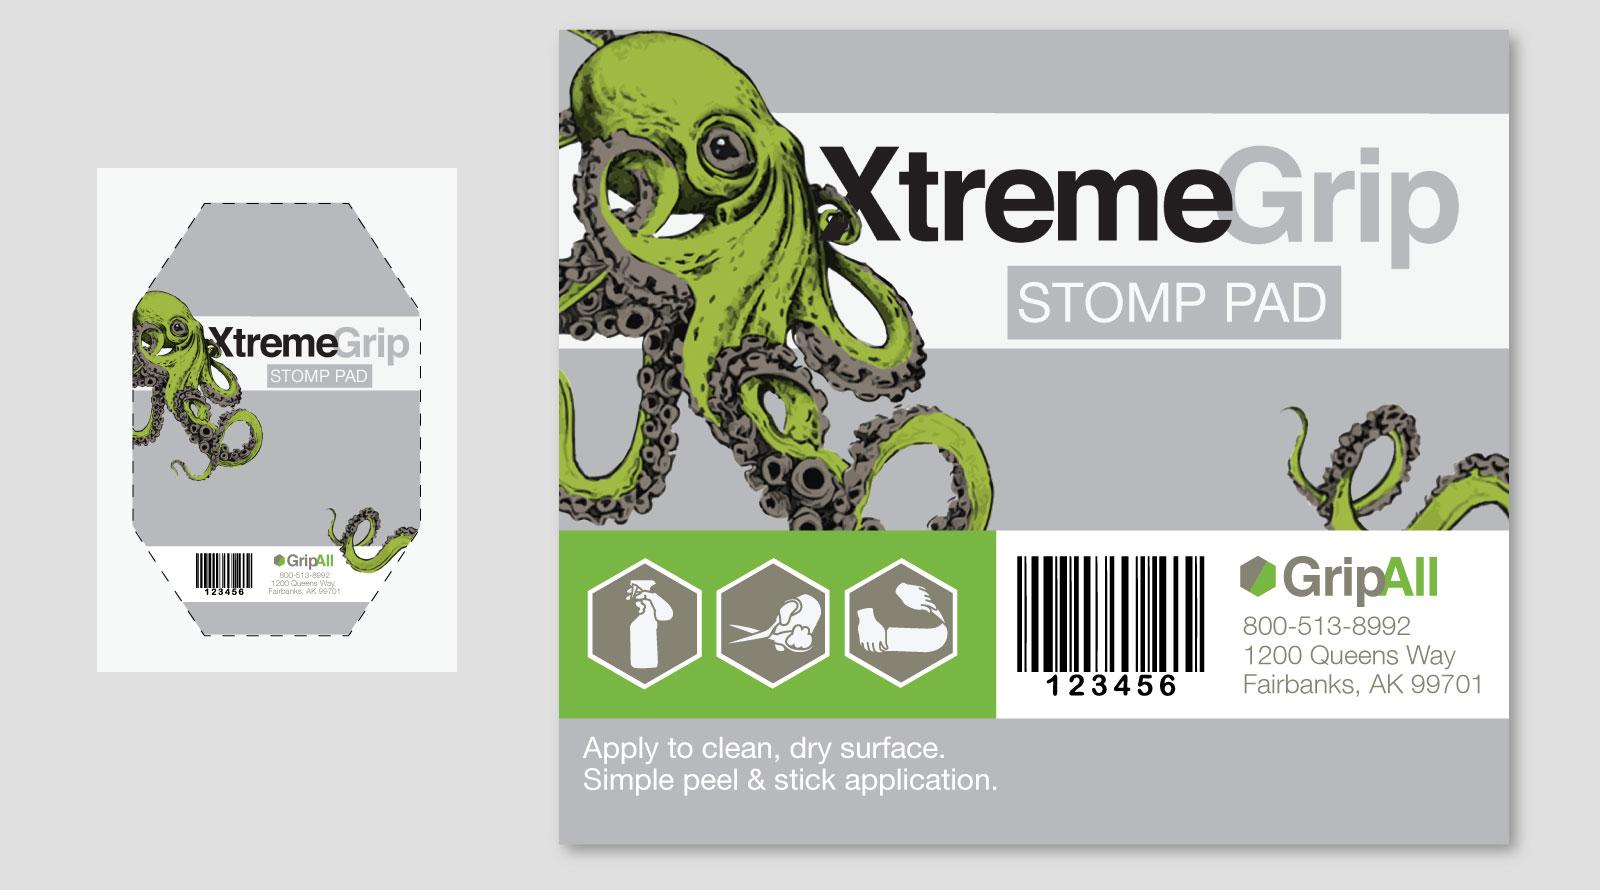 xtreme-grip-stomp-pad